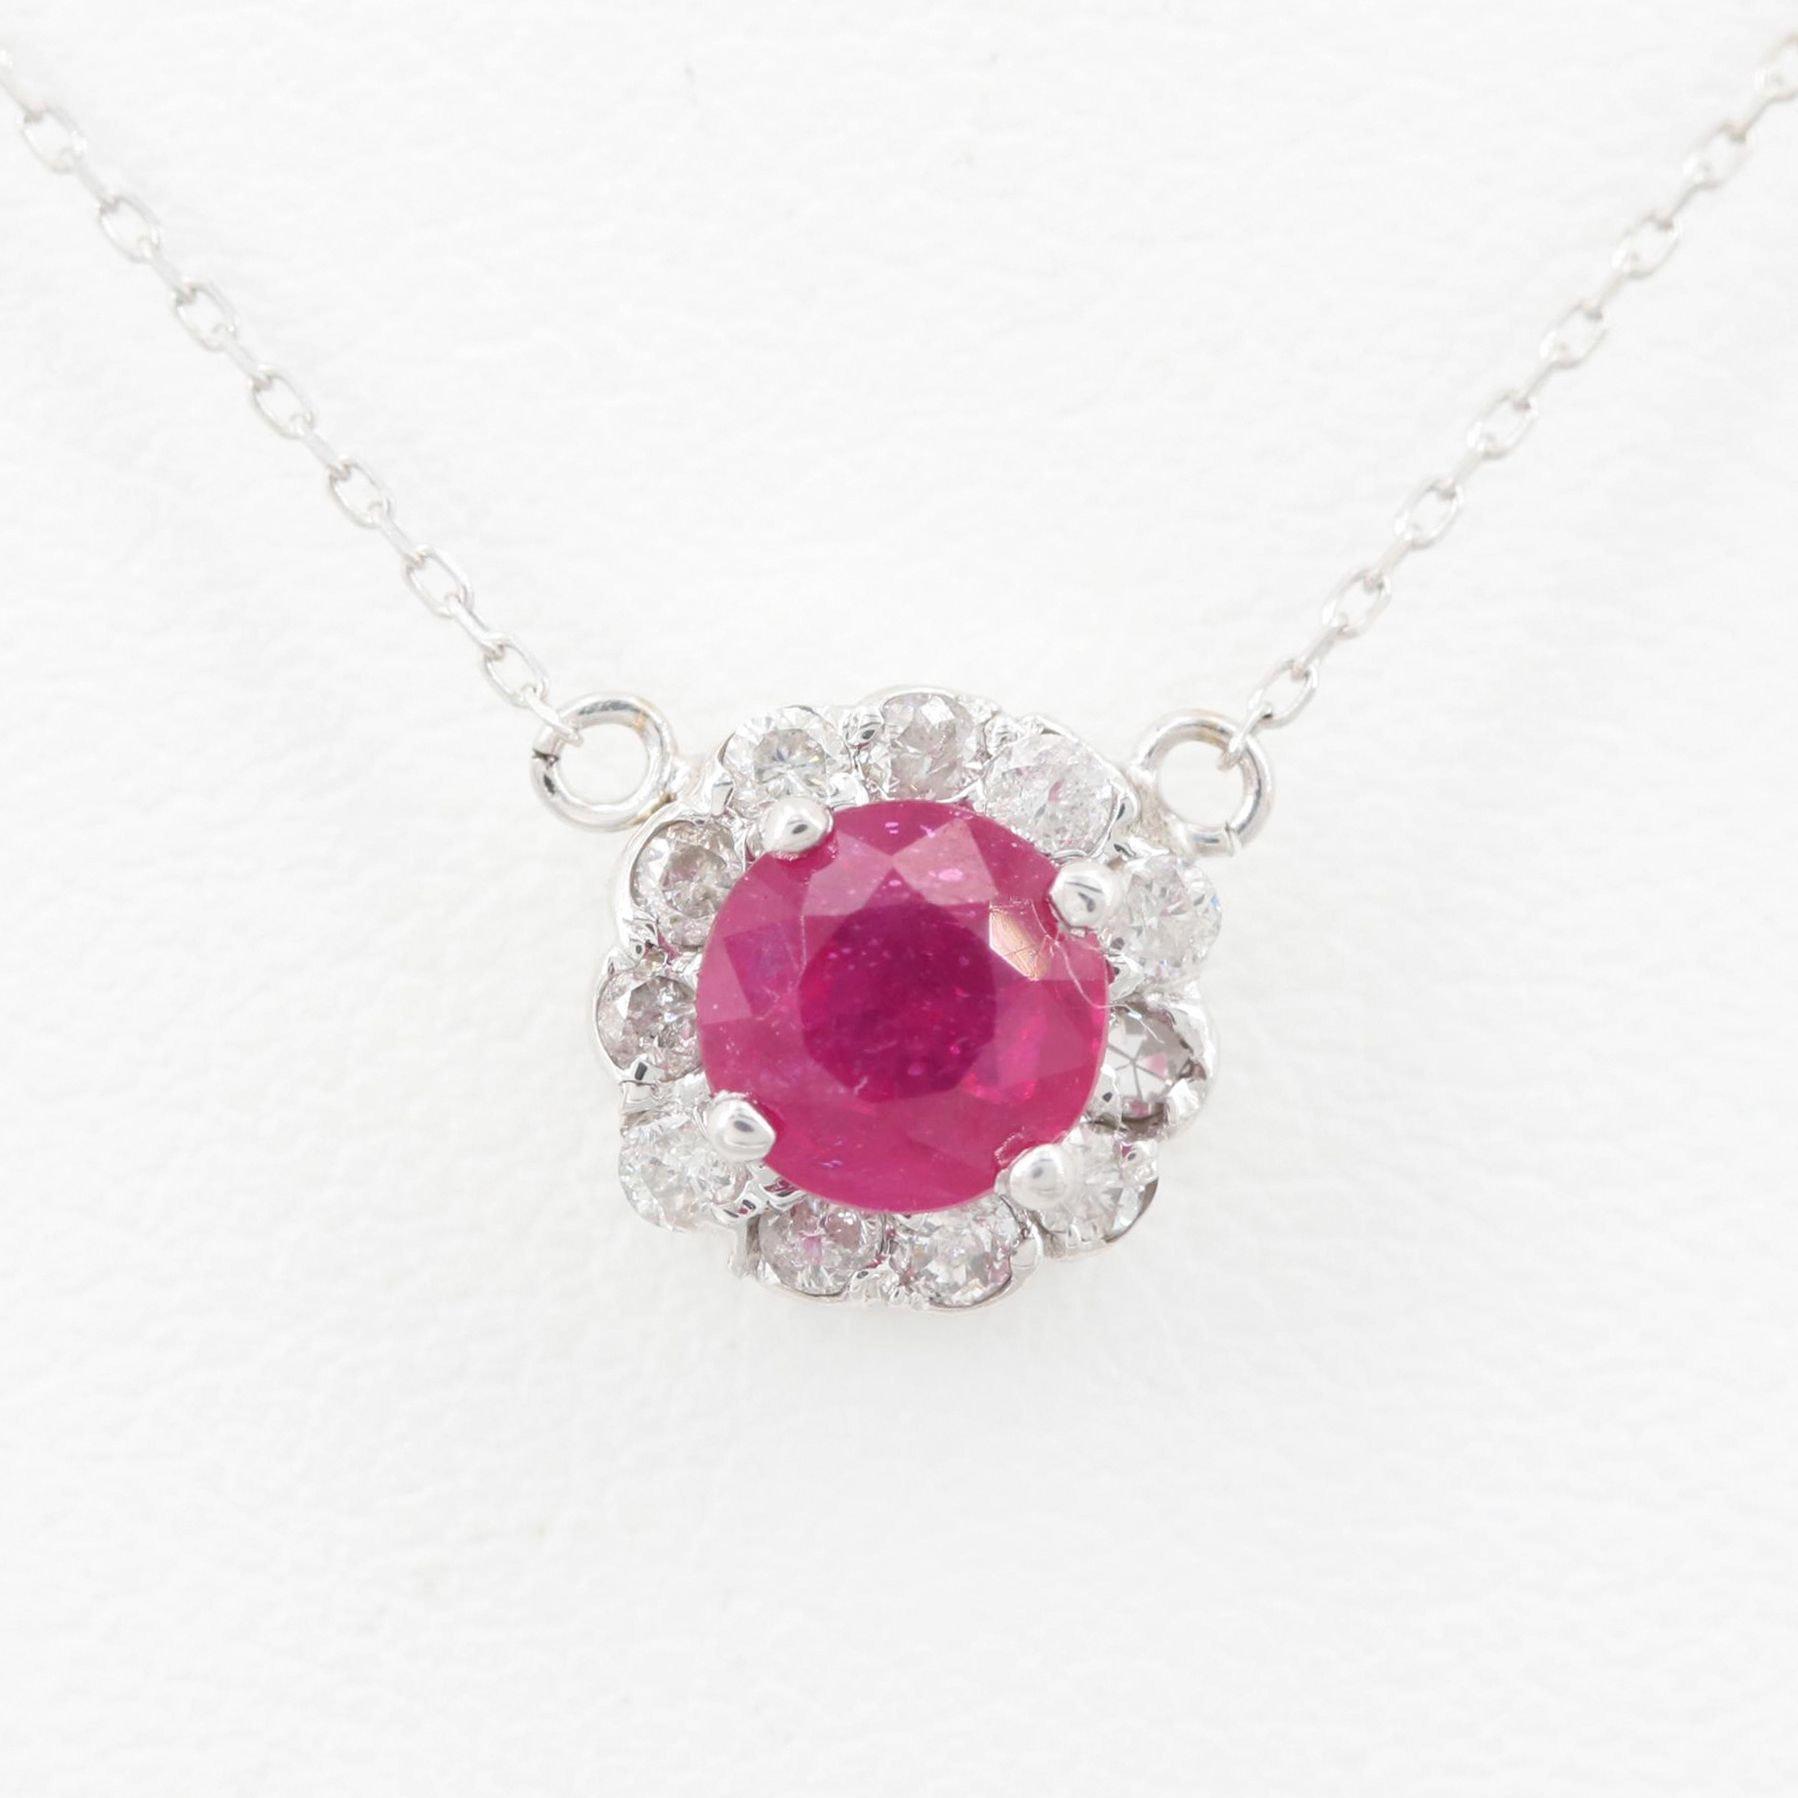 14K White Gold Glass Filled Corundum and Diamond Pendant Necklace